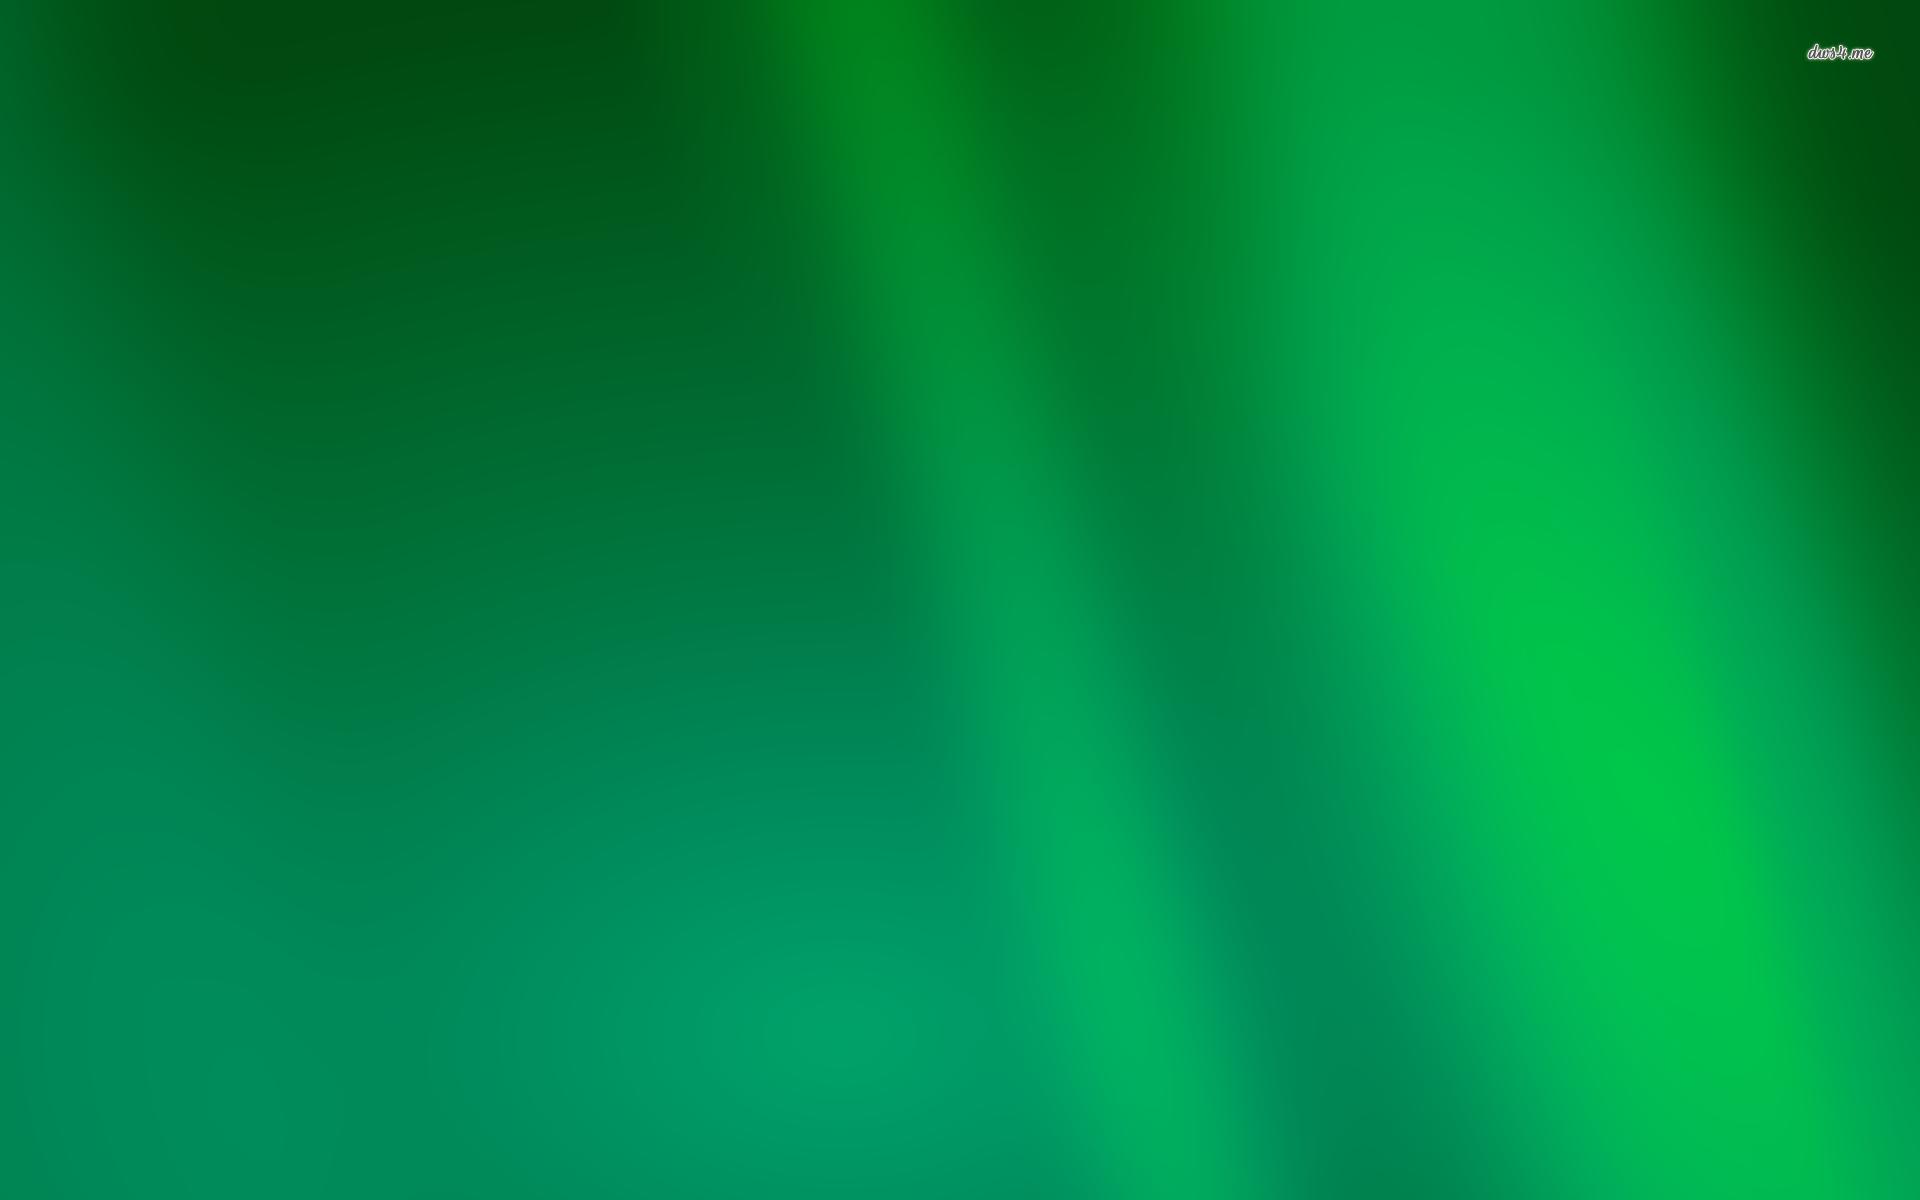 Aqua green wallpaper wallpapersafari - Green and turquoise wallpaper ...